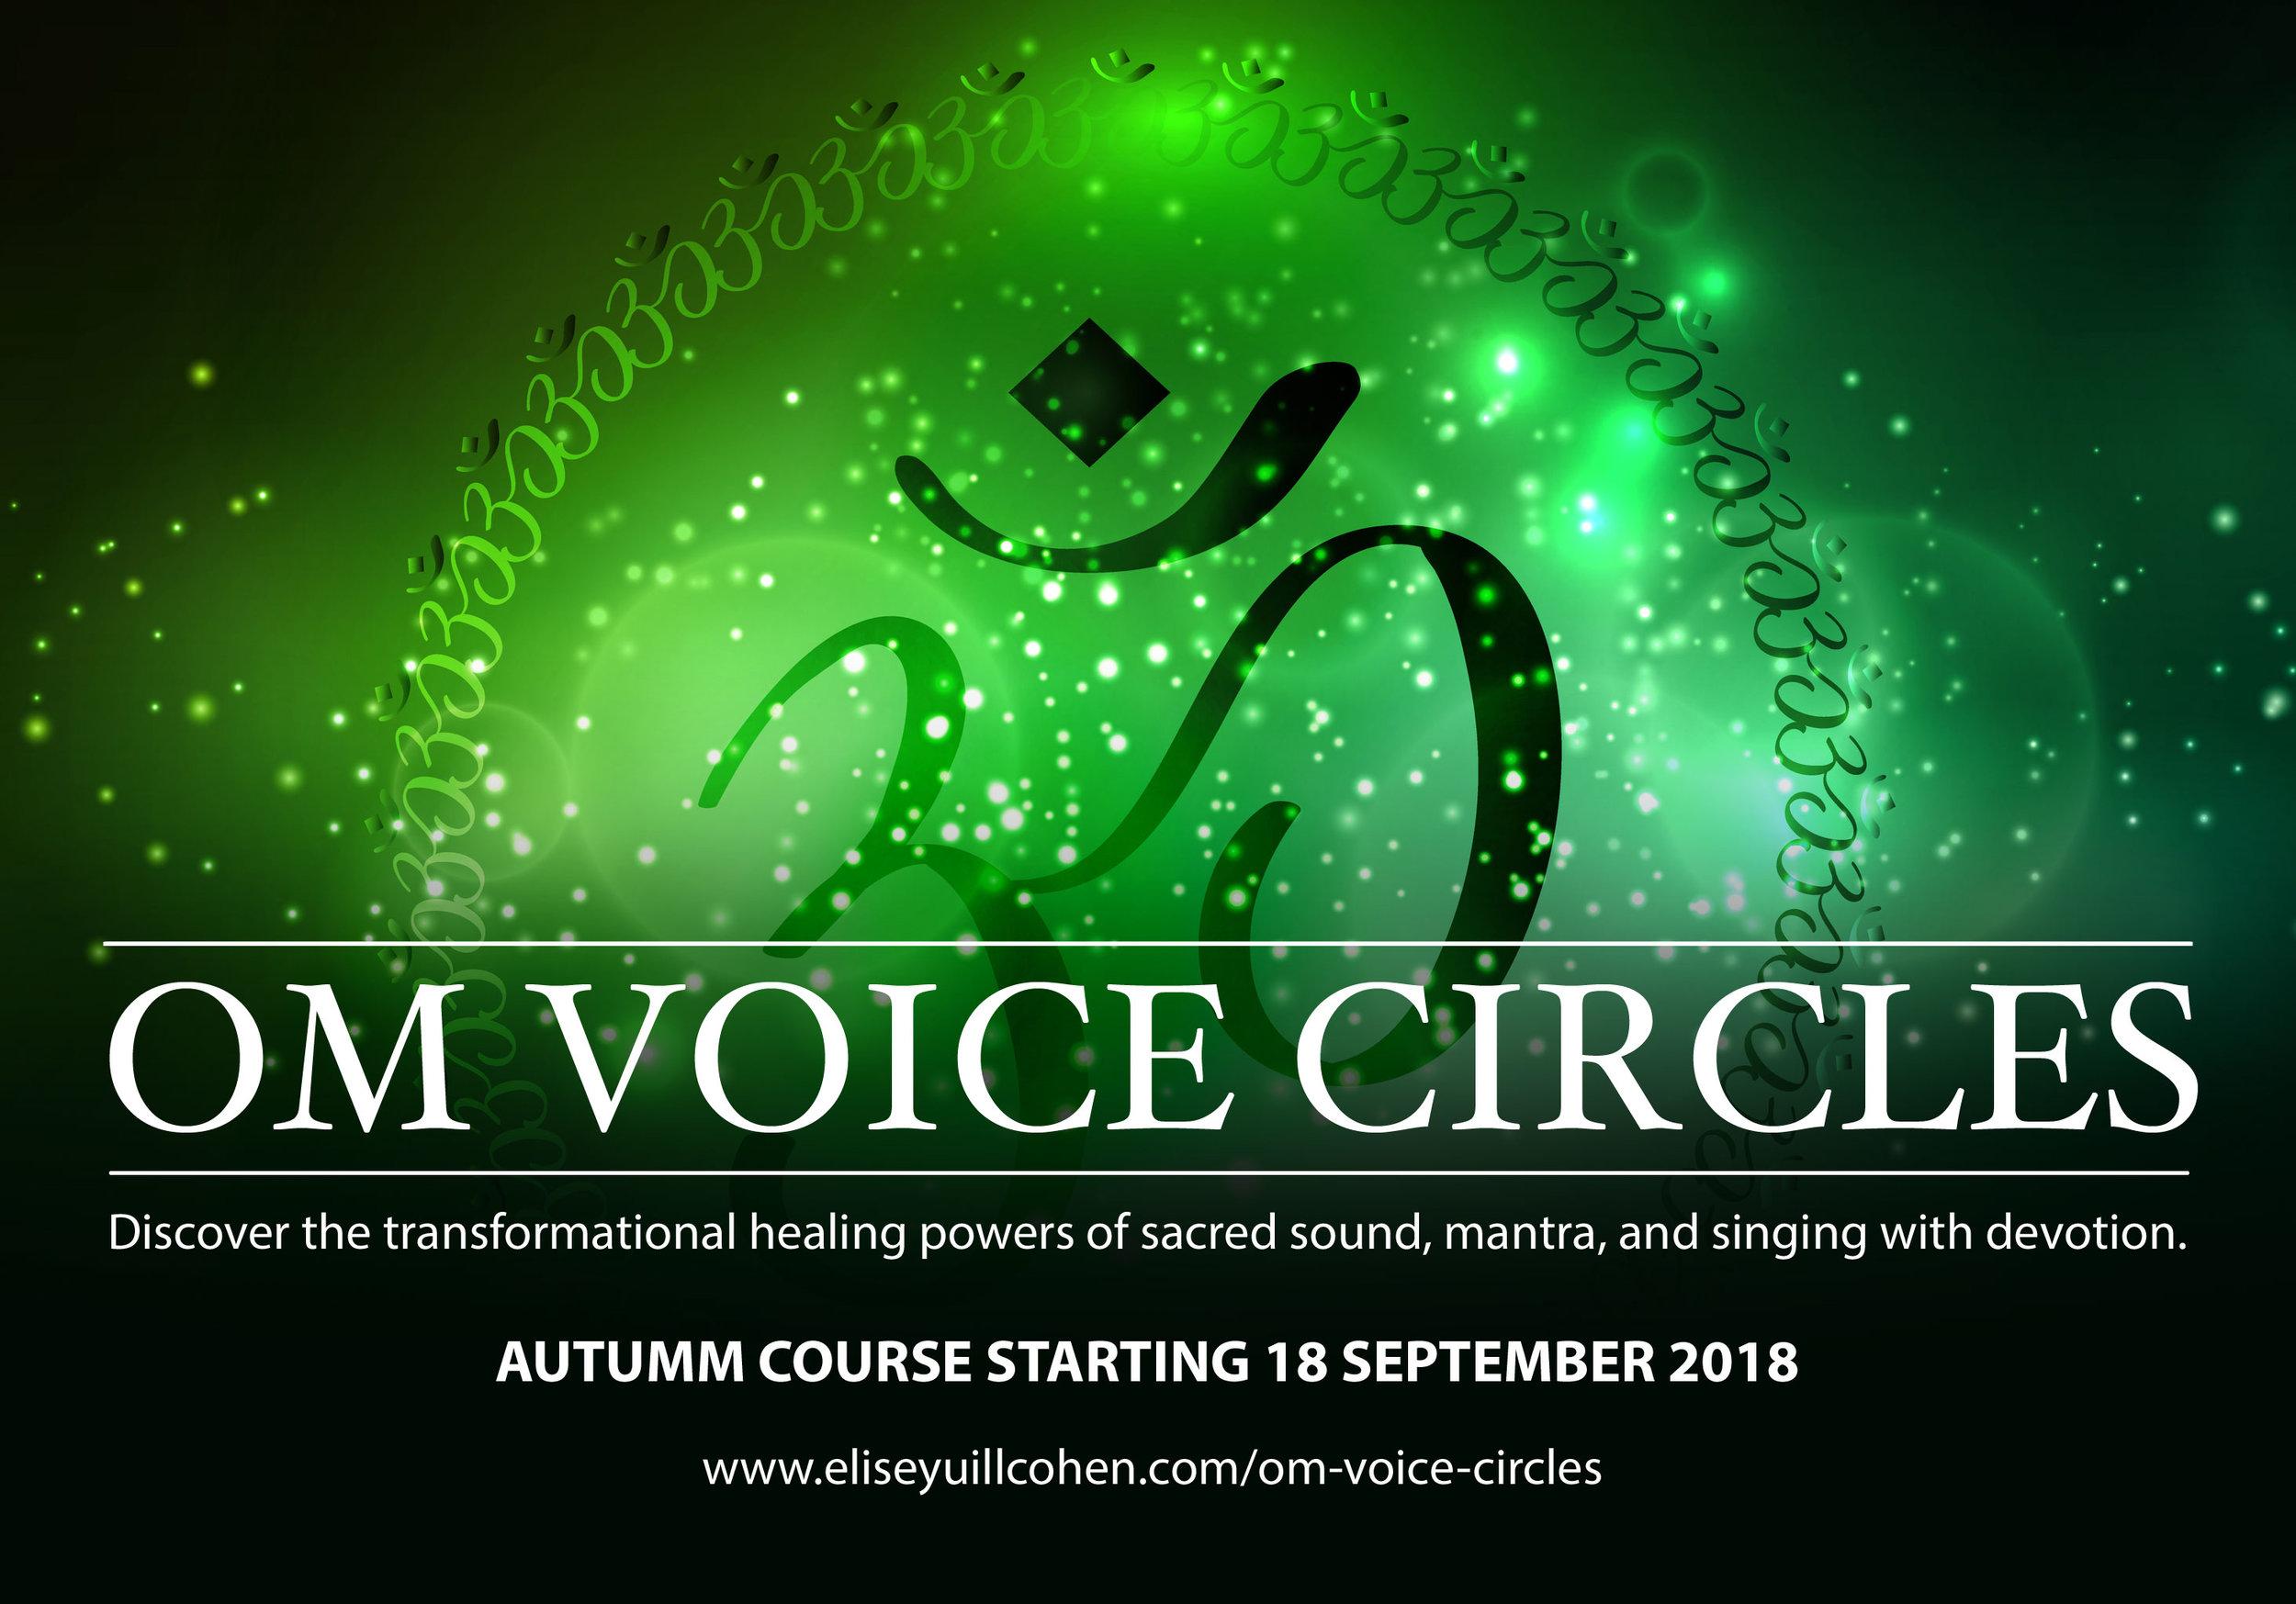 Om-Voice-Circles-Autumn-Flyer-FRONT.jpg